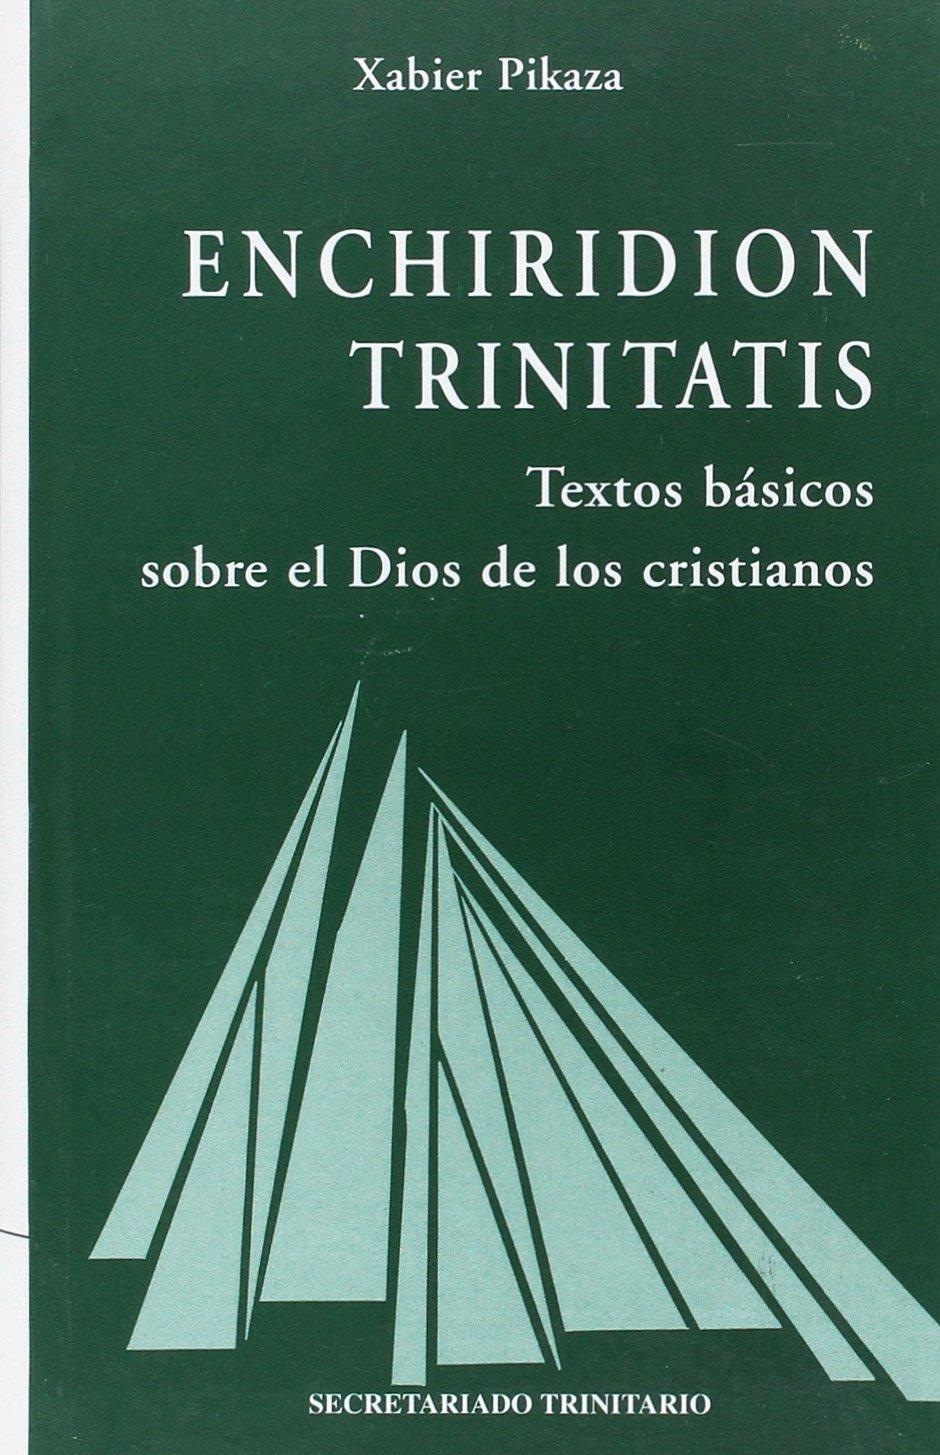 Enchiridion Trinitatis: 40 (Ágape): Amazon.es: Pikaza, Xabier: Libros